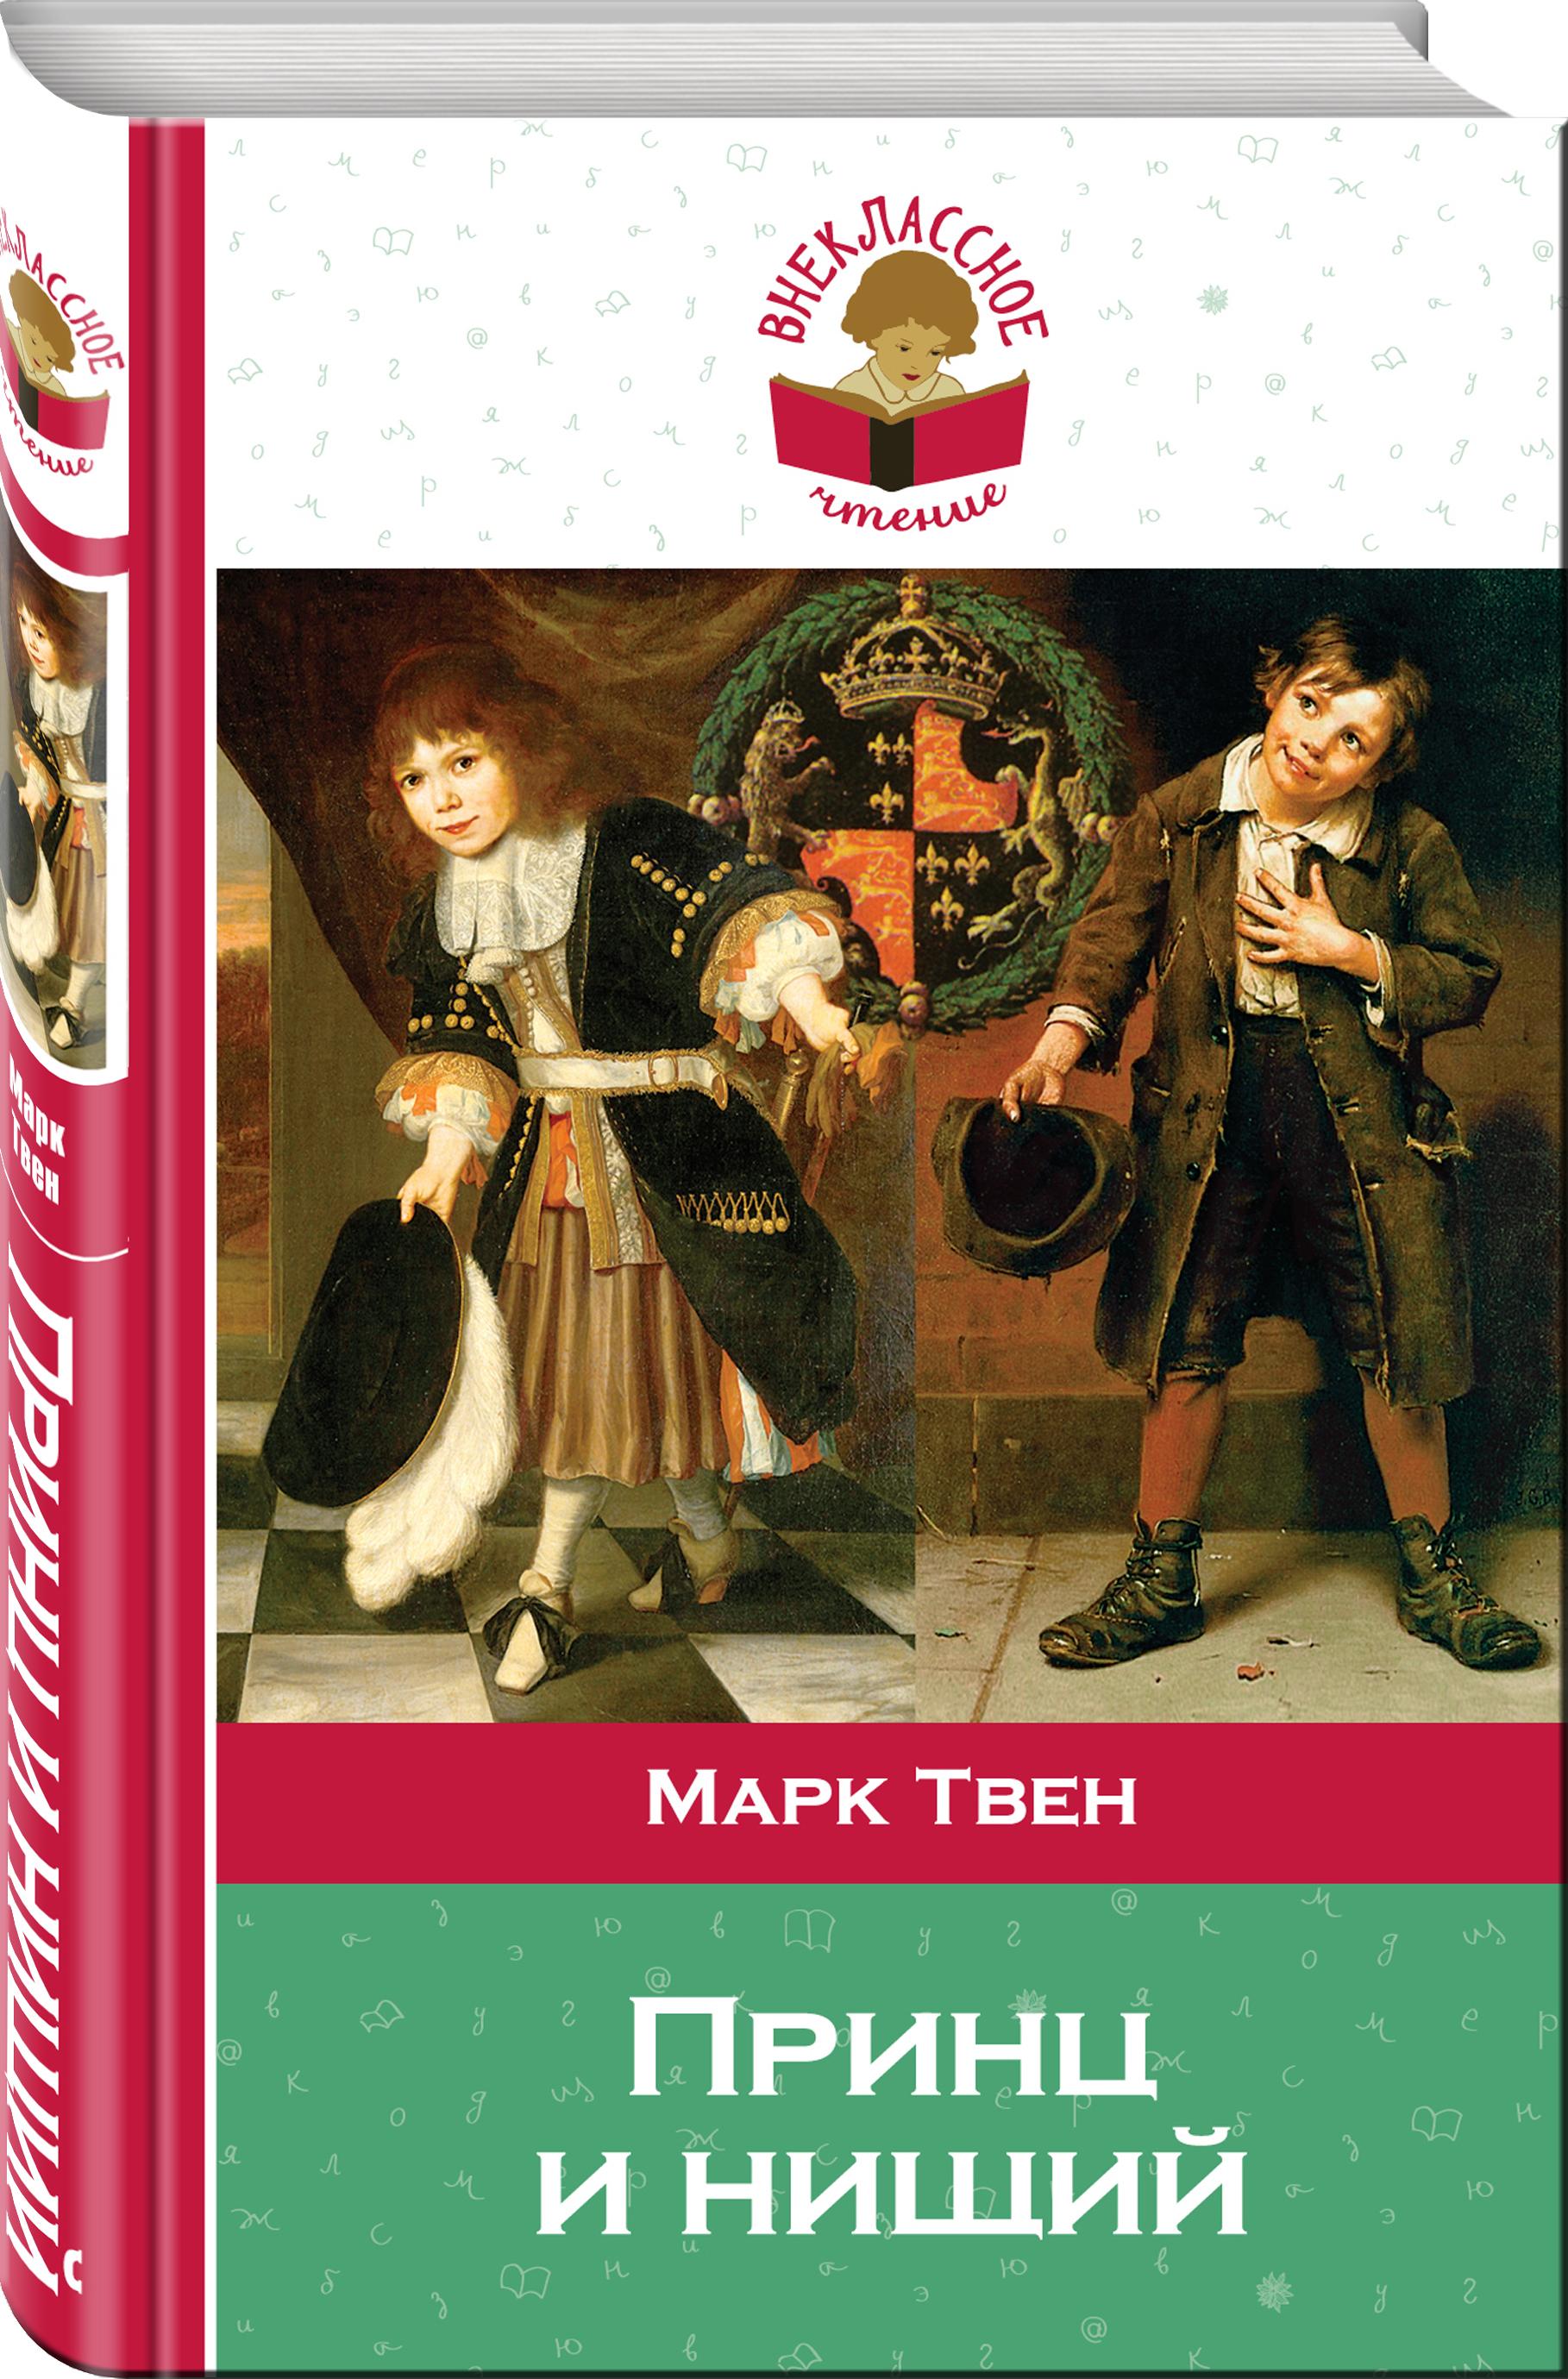 Марк Твен Принц и нищий твен марк the prince and the pauper принц и нищий уровень 2 isbn 978 5 17 091984 0